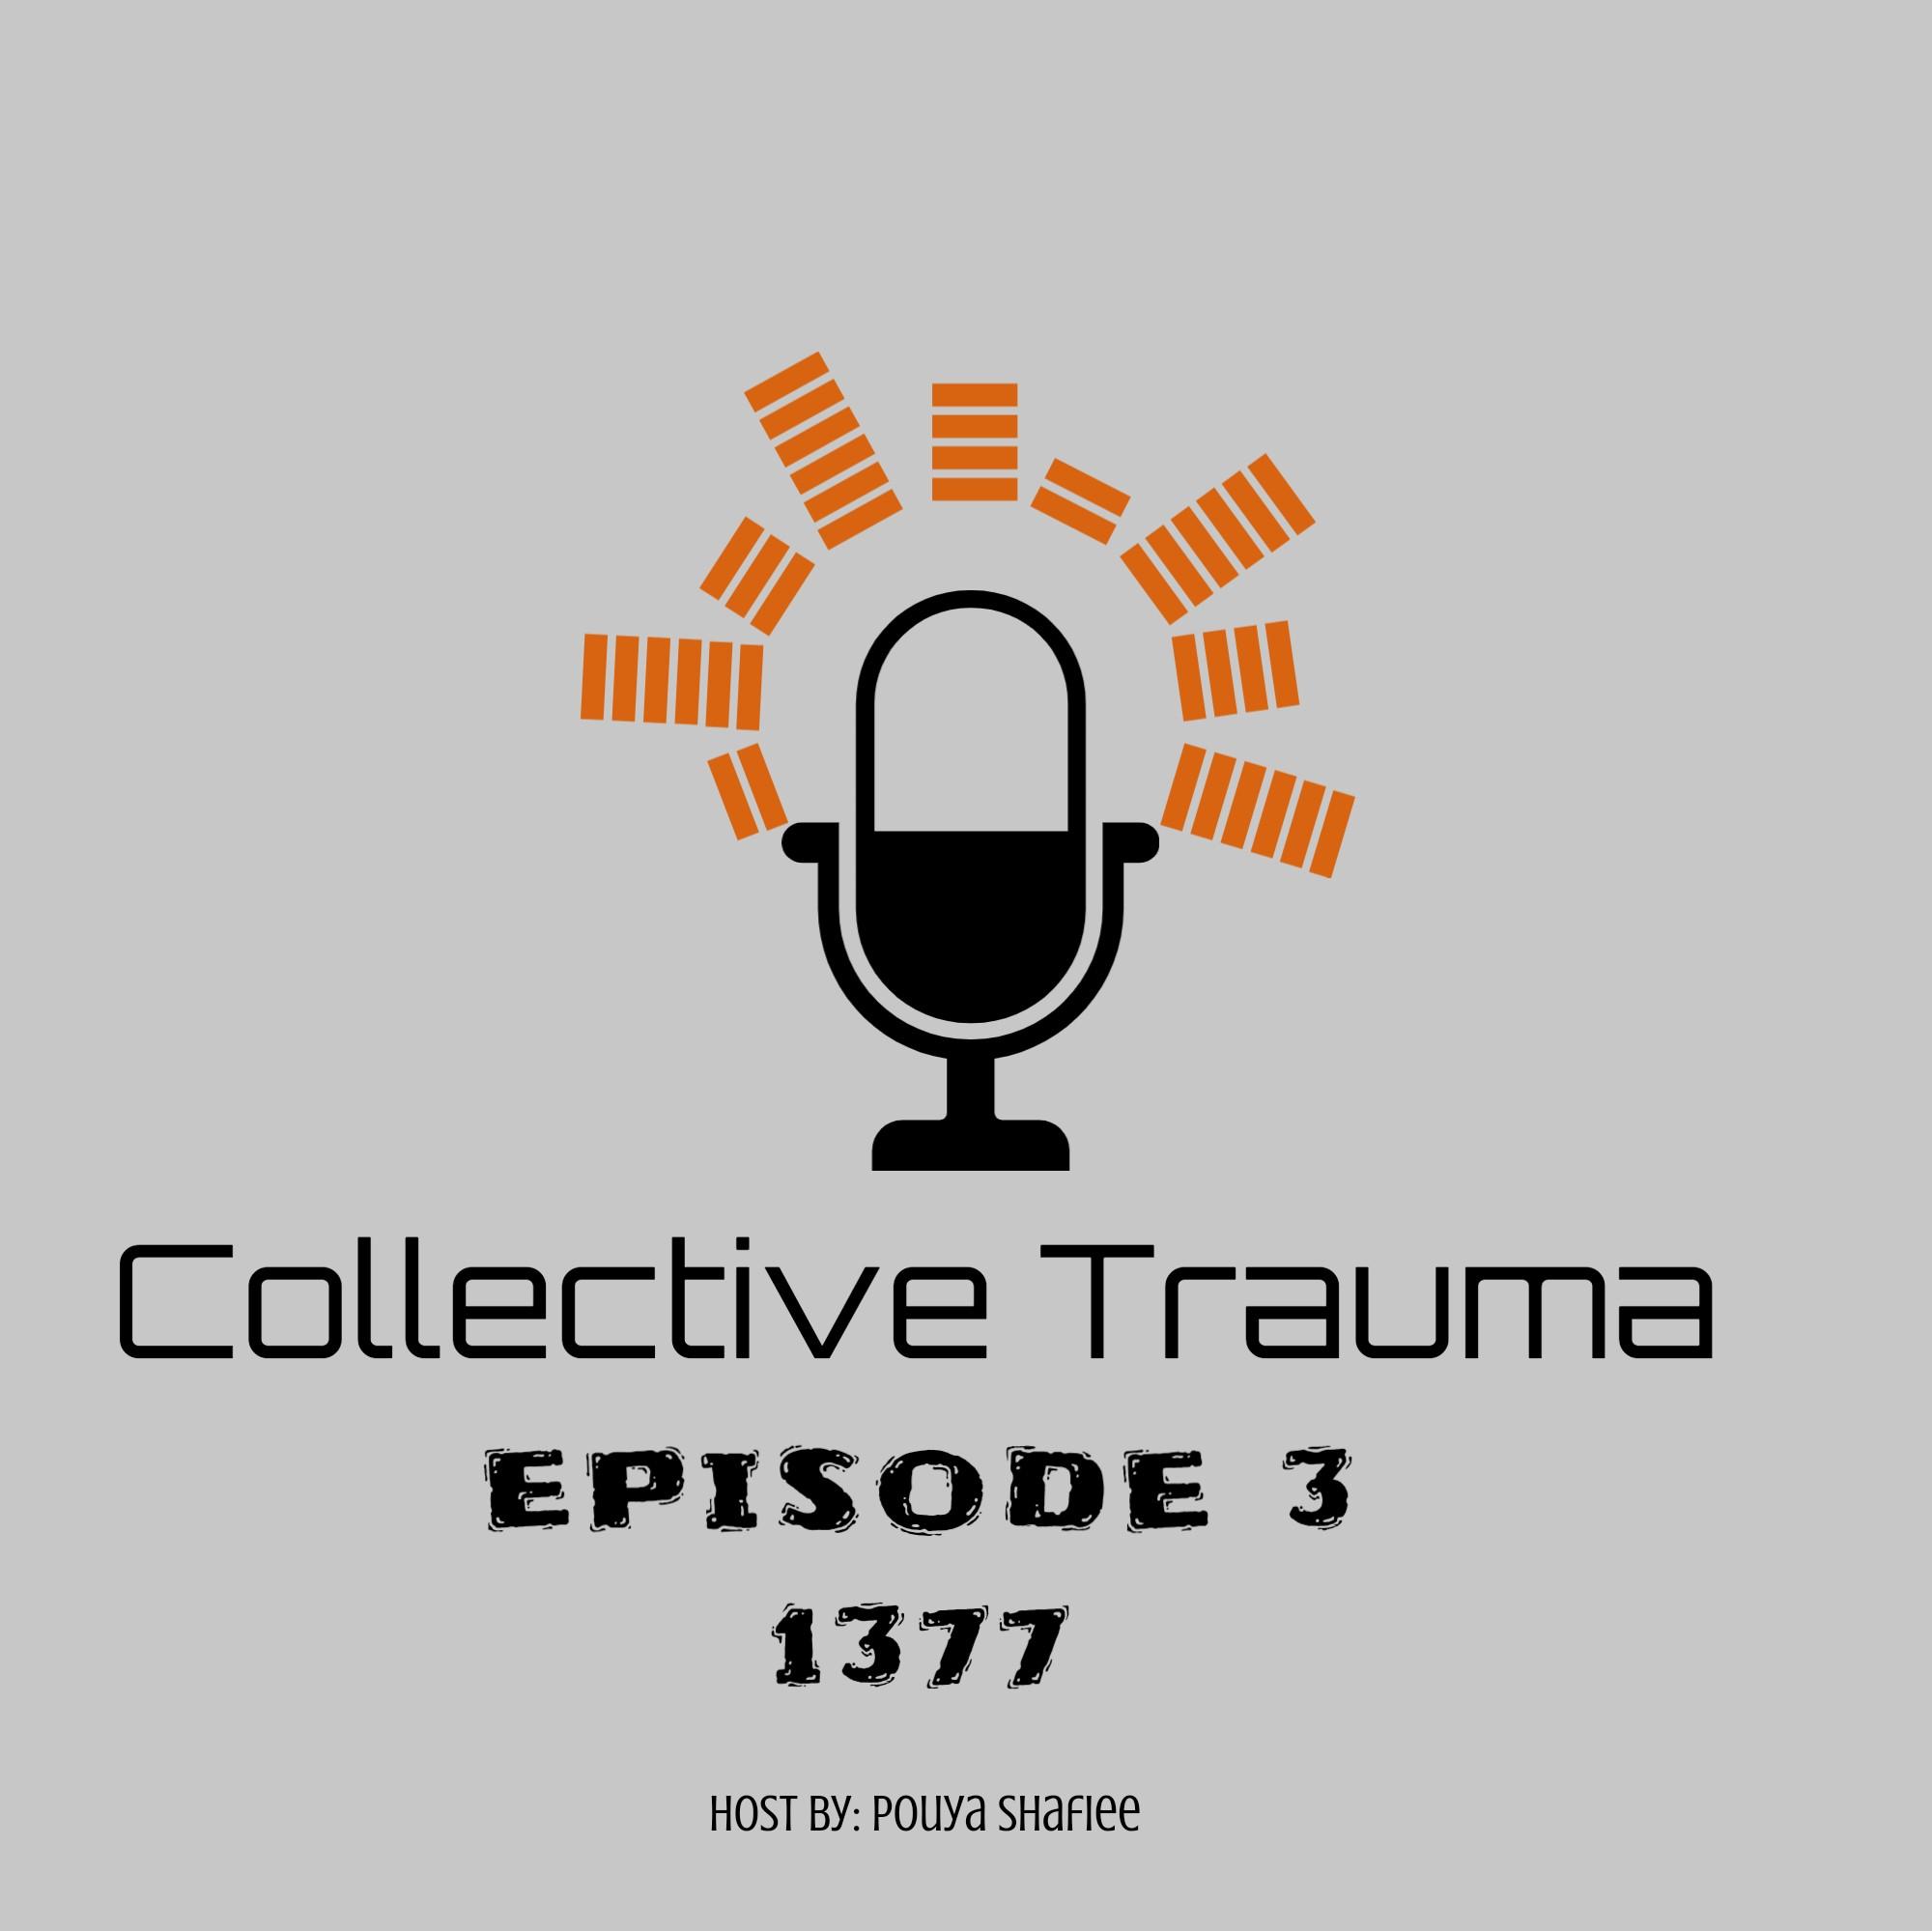 Collective Truma S1E03 اپیزود سوم فصل اول ترومای جمعی